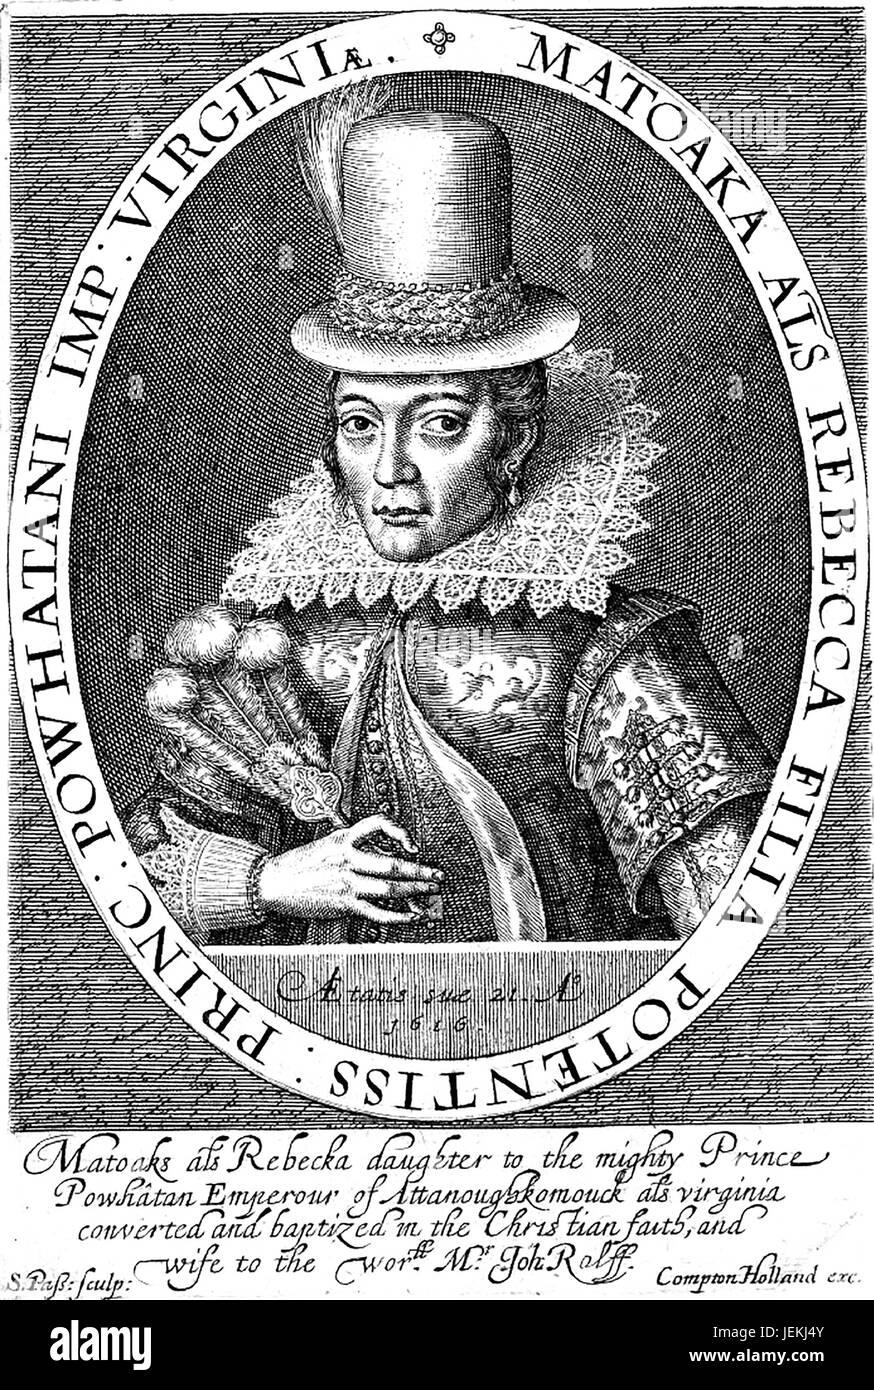 POCAHONTAS (c 1596-1617) Native American in a 1616 engraving by Simon de Passe - Stock Image